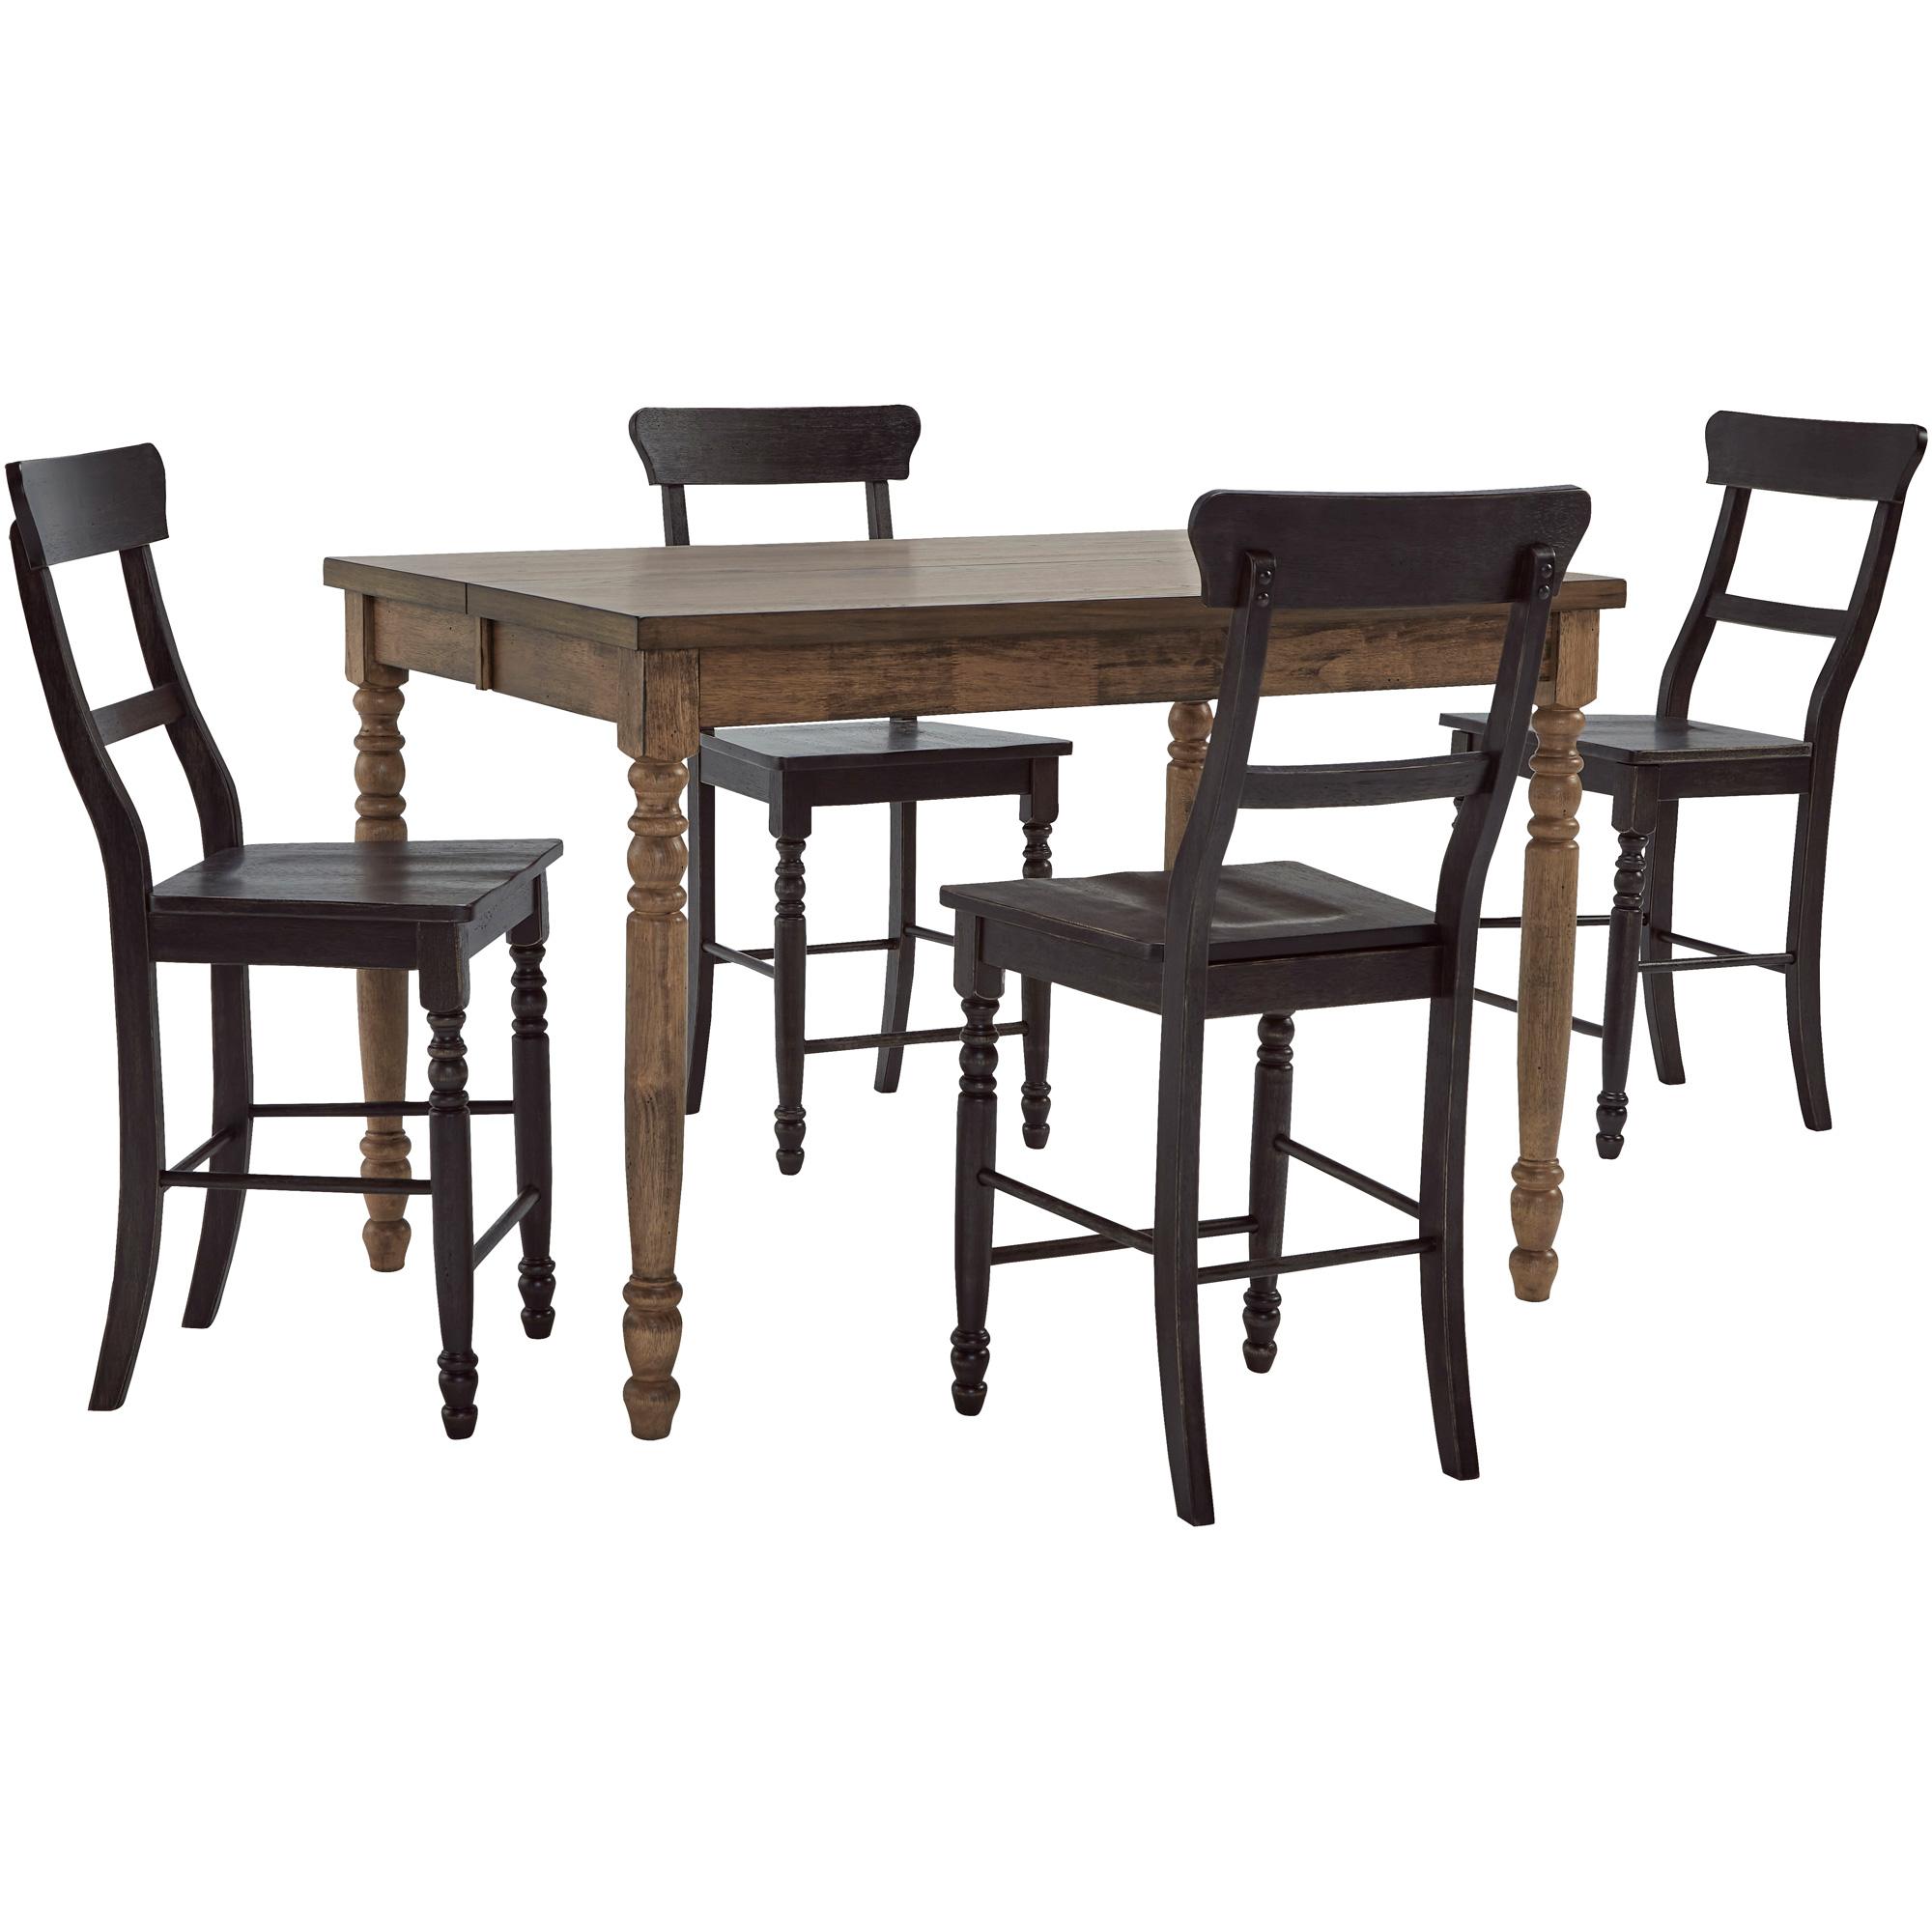 Progressive Furniture Inc. | Savannah Court Antique Oak and Black 5 Piece Counter Dining Set